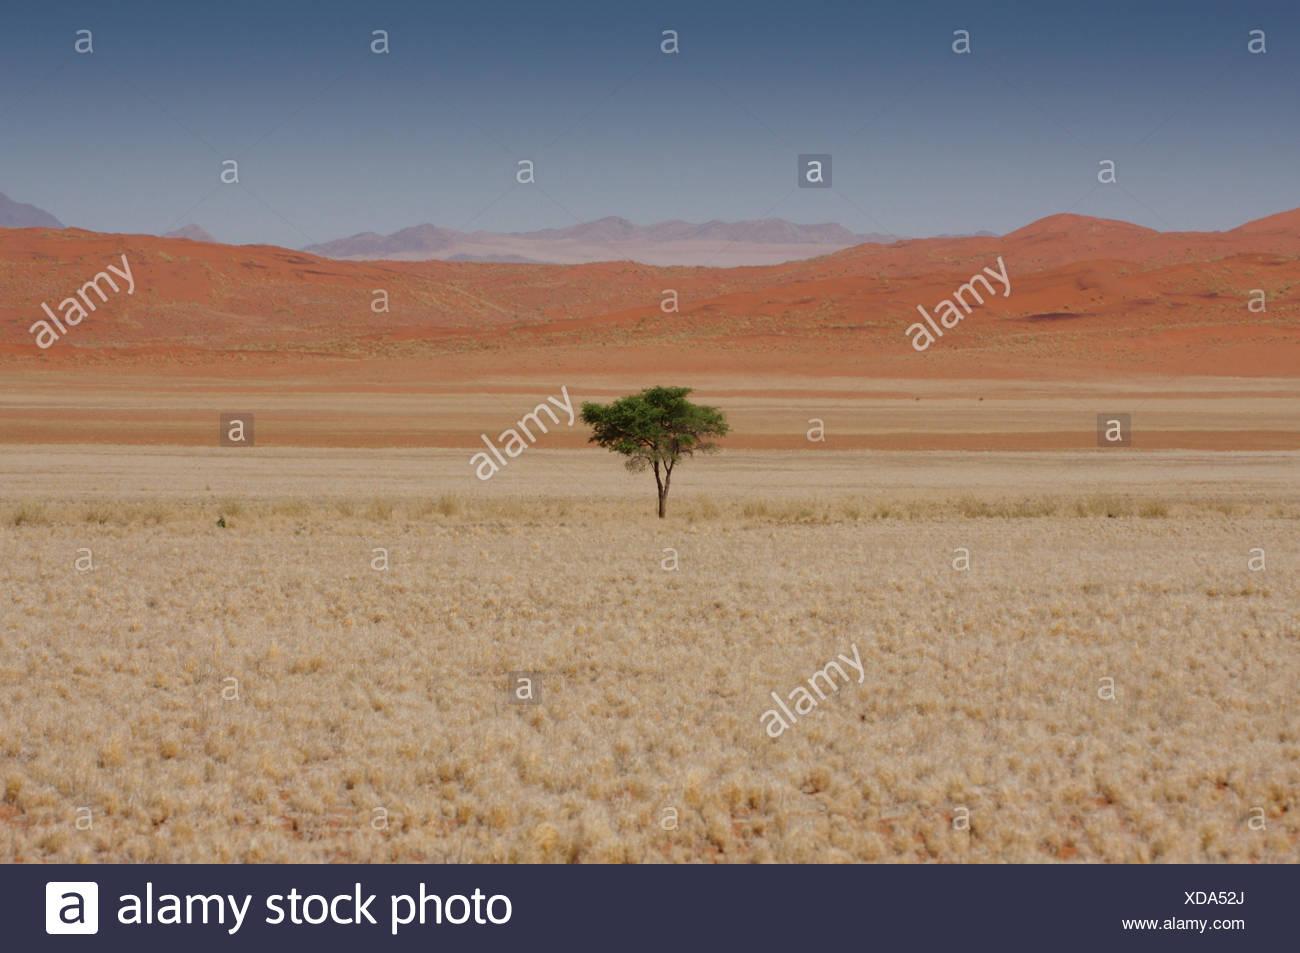 tree desert wasteland - Stock Image